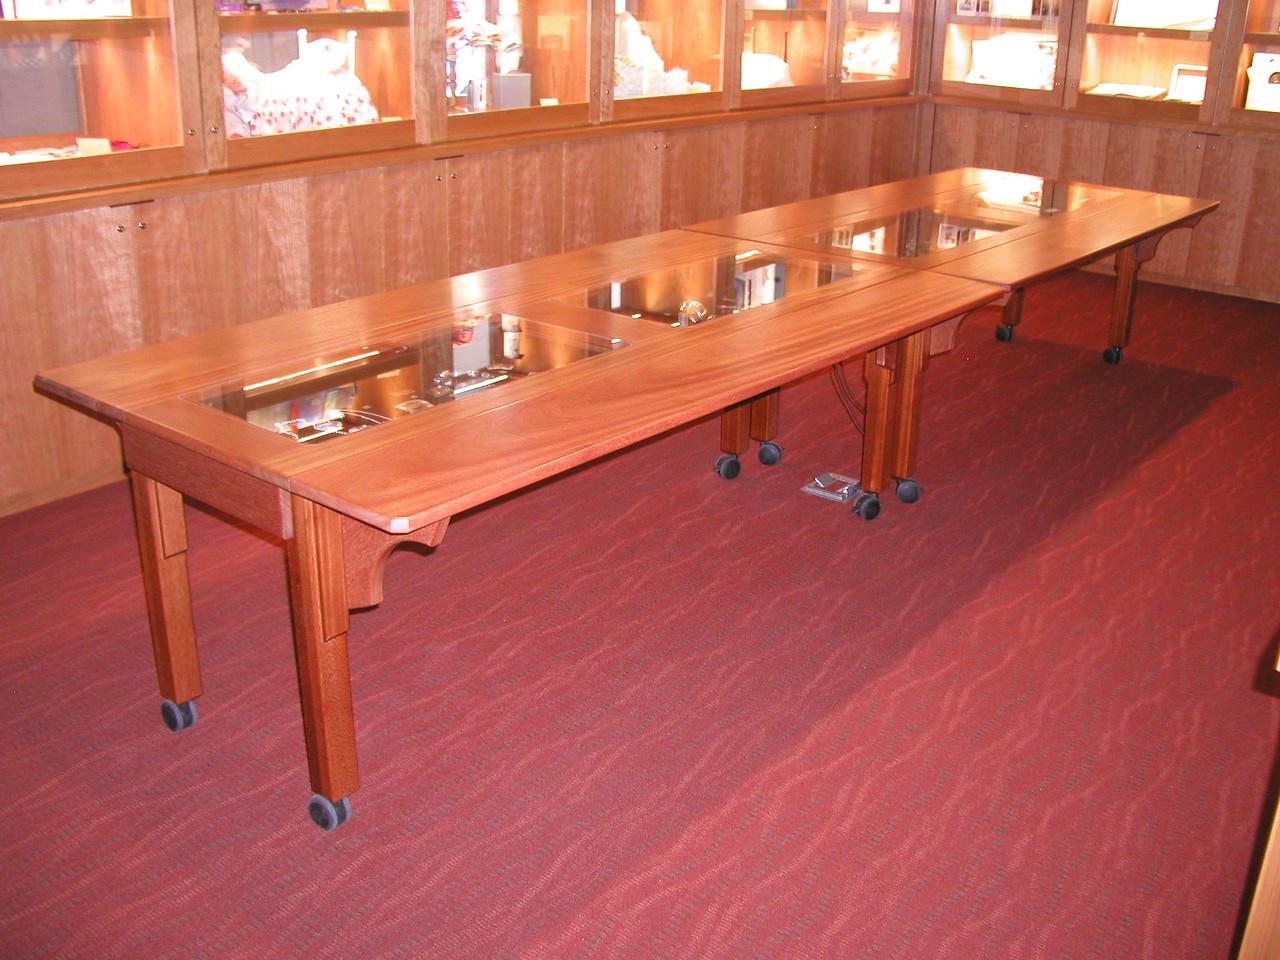 Display Tables at the Bainbridge Island Art Museum